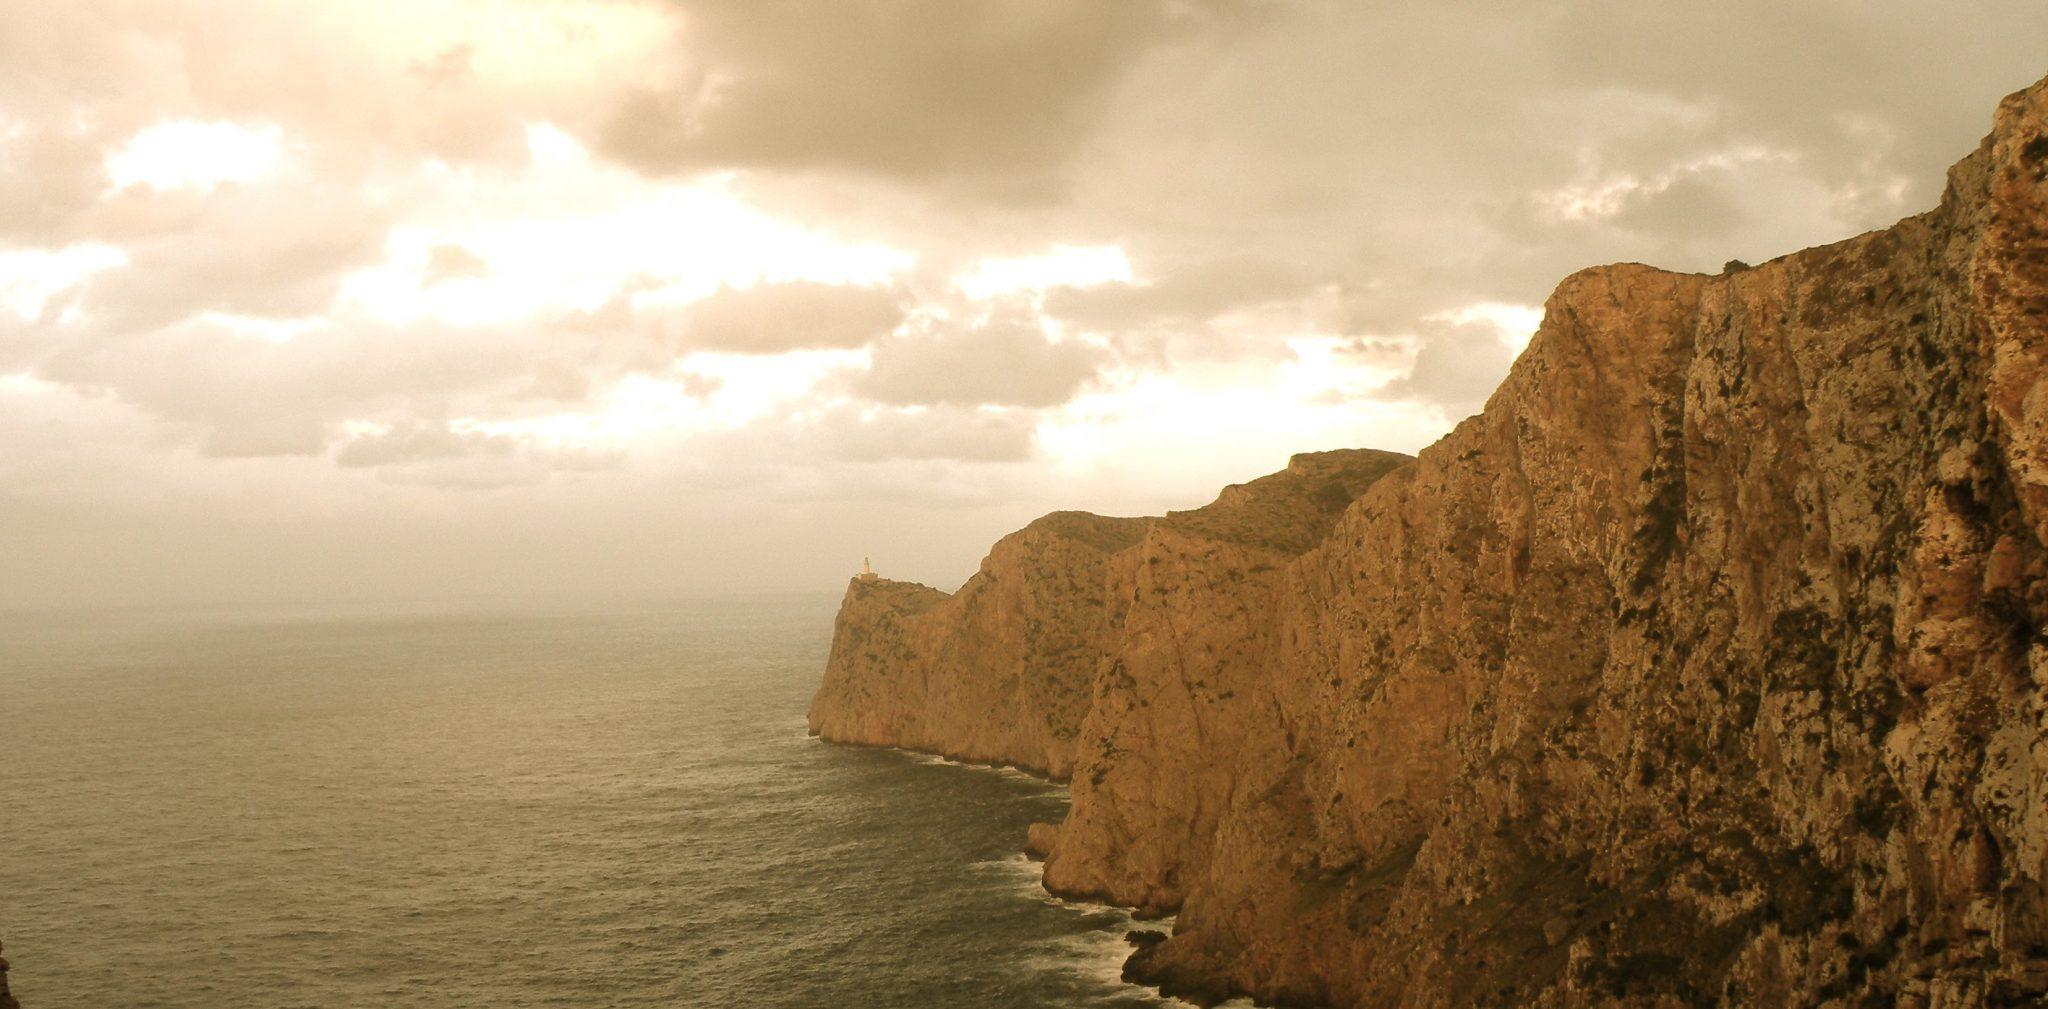 4 + 1 Circular trekking routes in Majorca